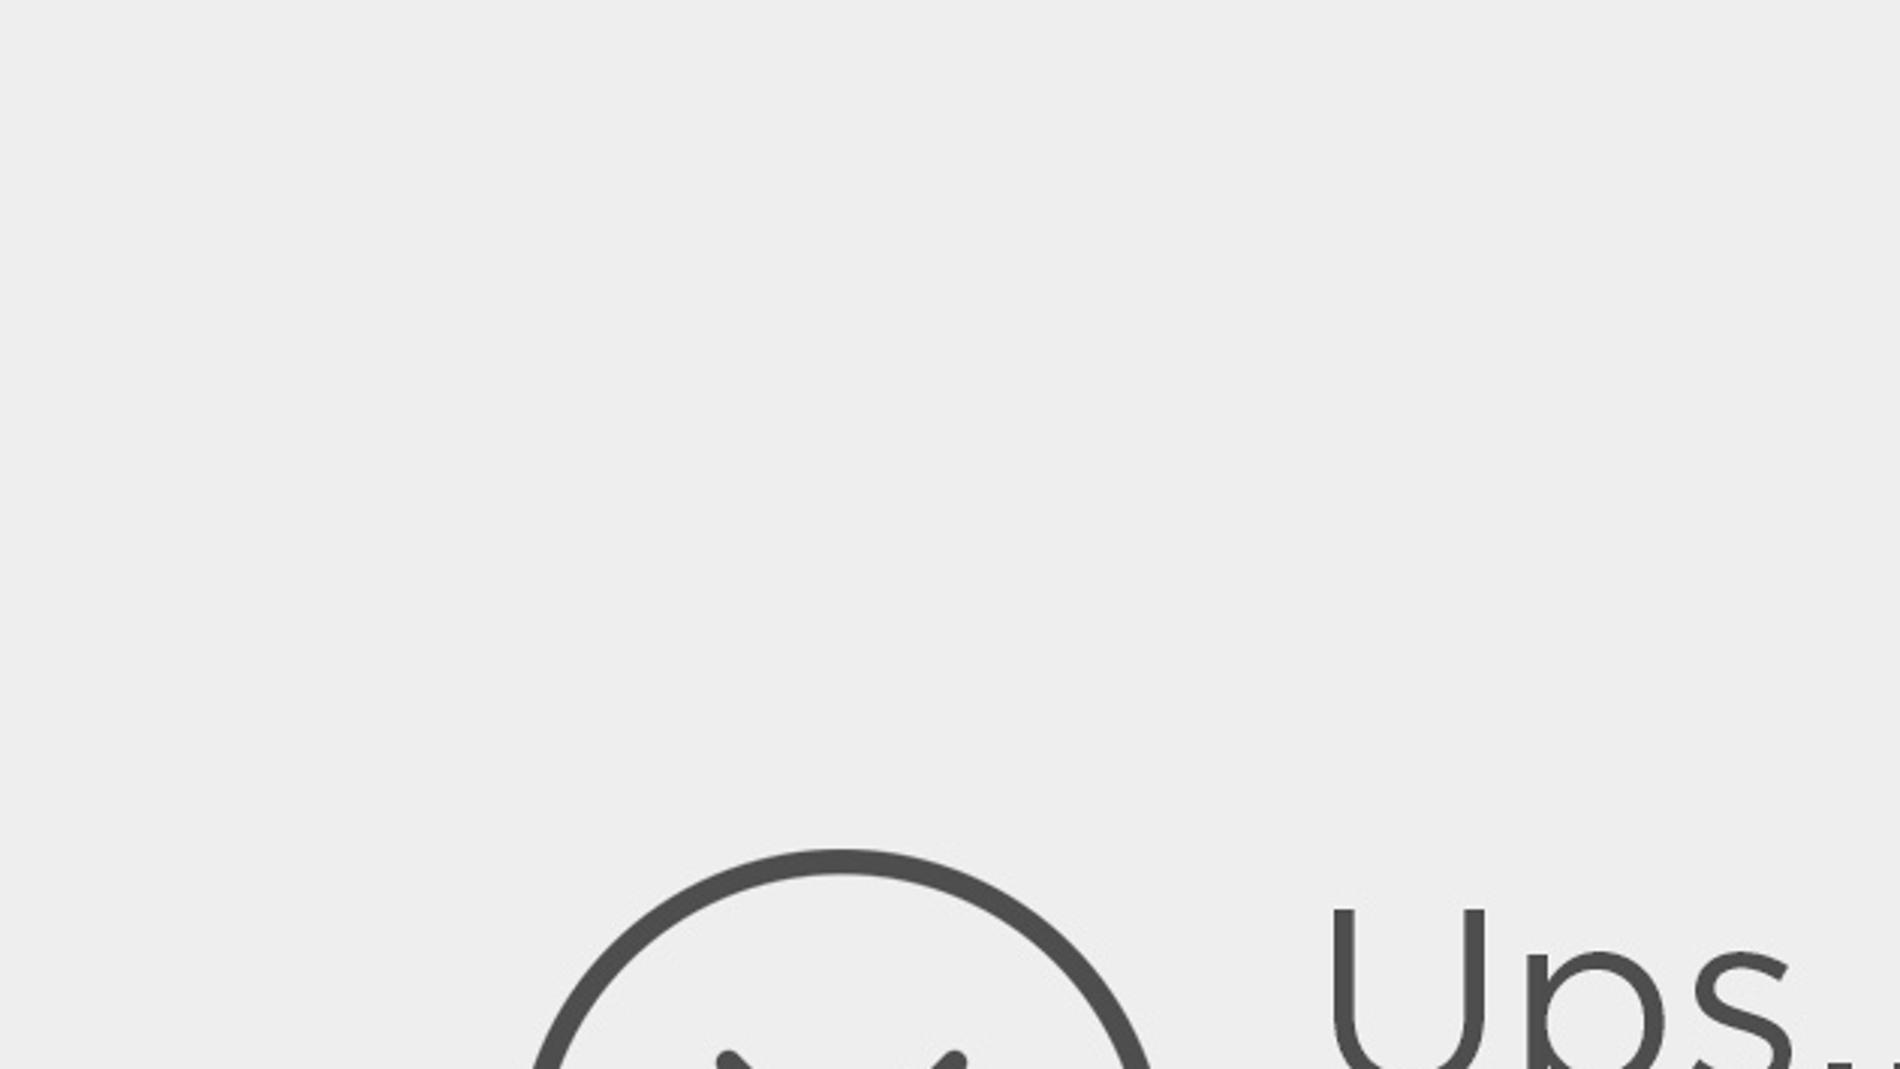 Brad Pitt, Christian Bale y Ryan Gosling, juntos en 'The Big Short'Brad Pitt, Christian Bale y Ryan Gosling, juntos en 'The Big Short'